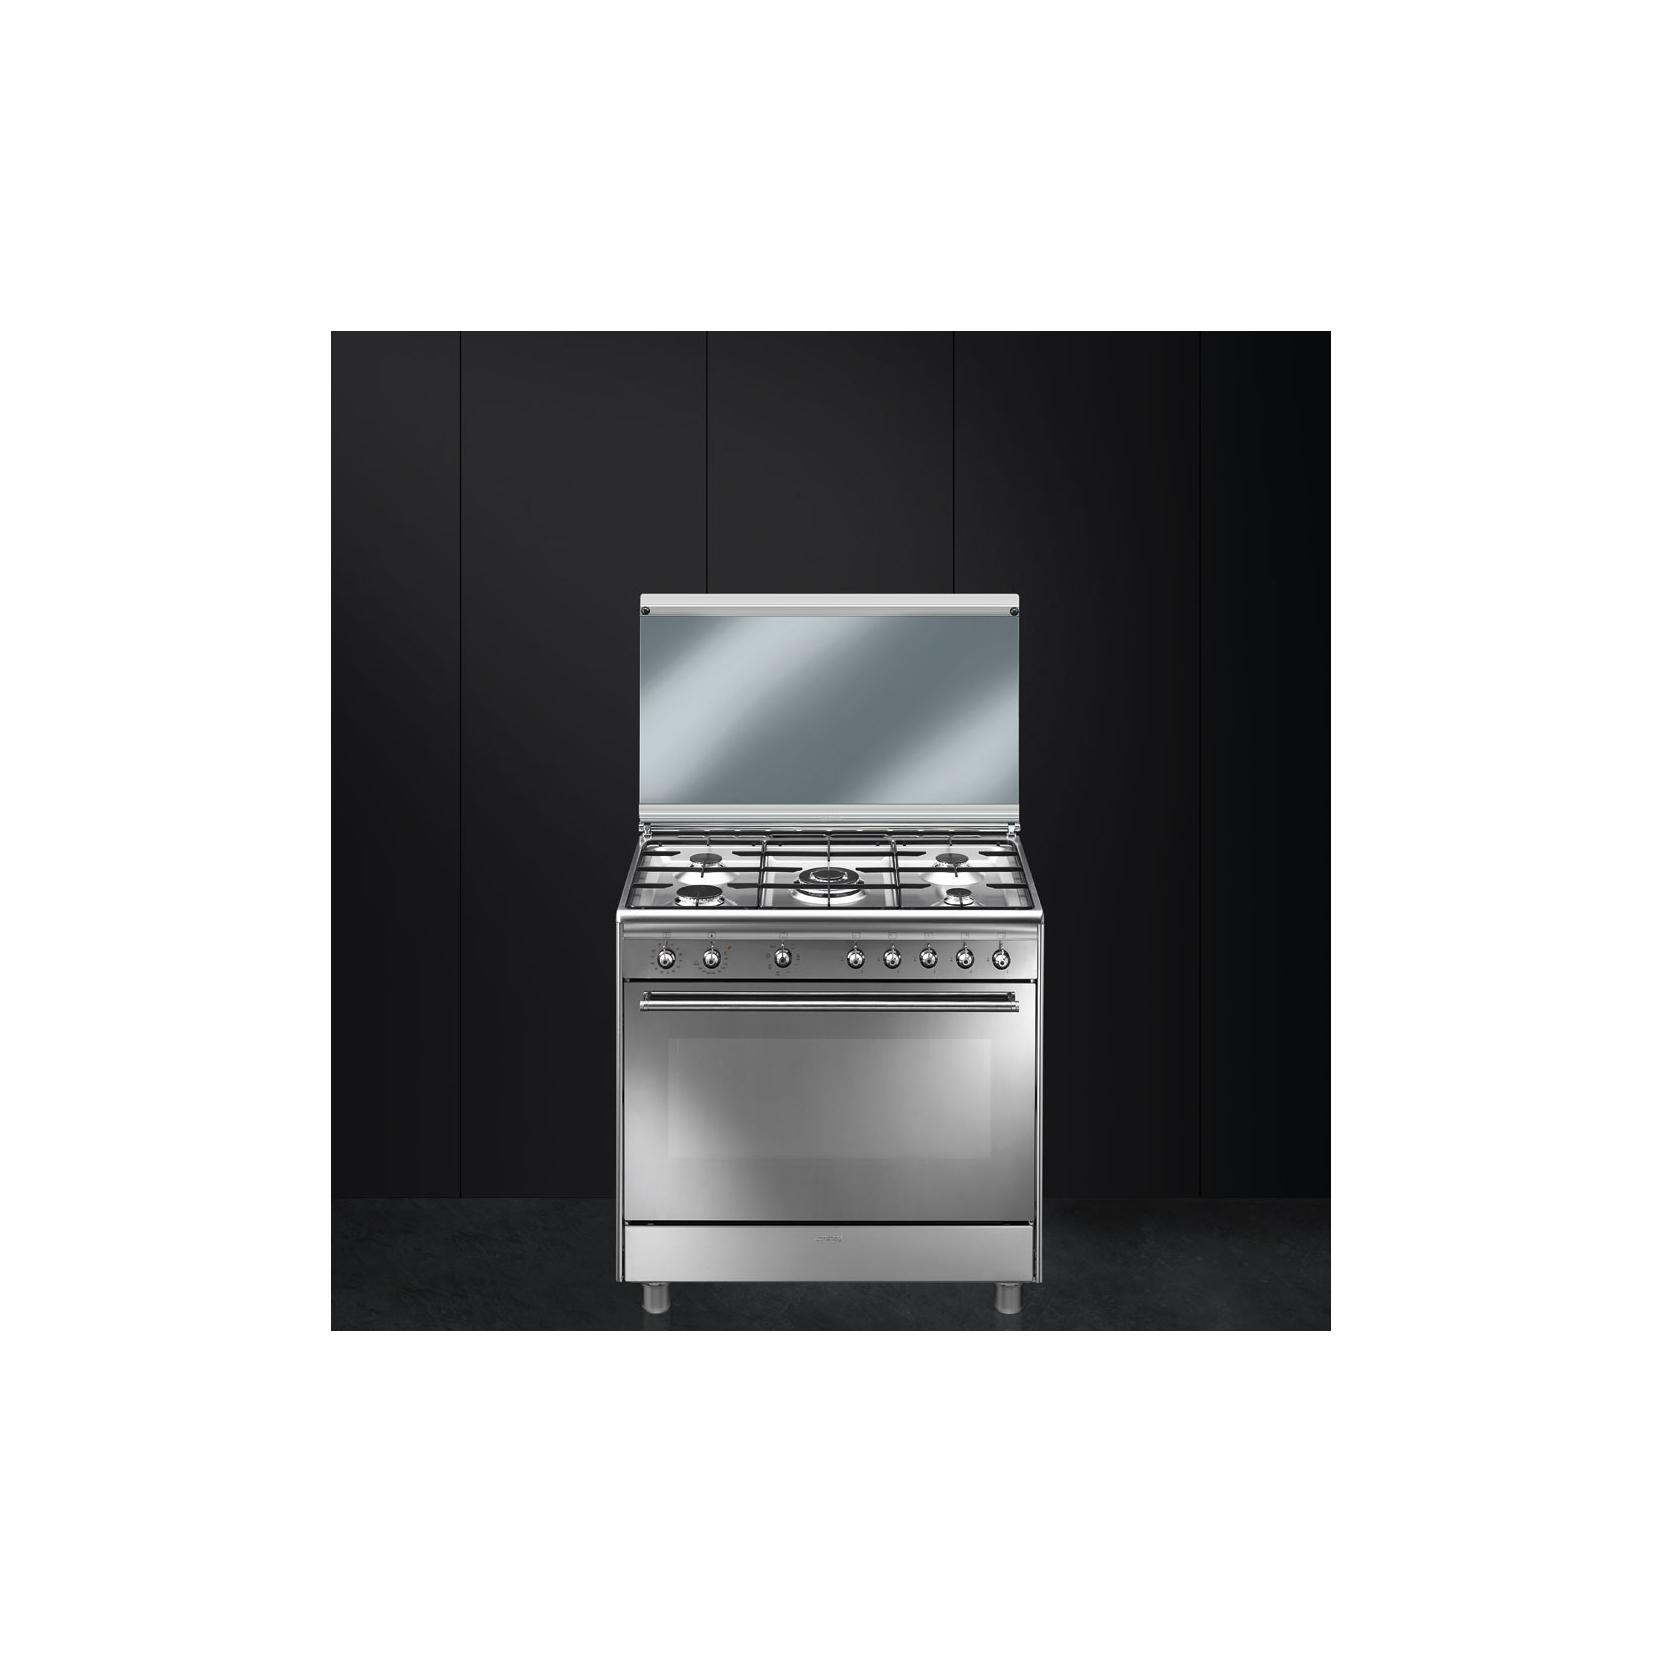 Emejing Cucine A Gas Smeg Images - Design & Ideas 2018 ...